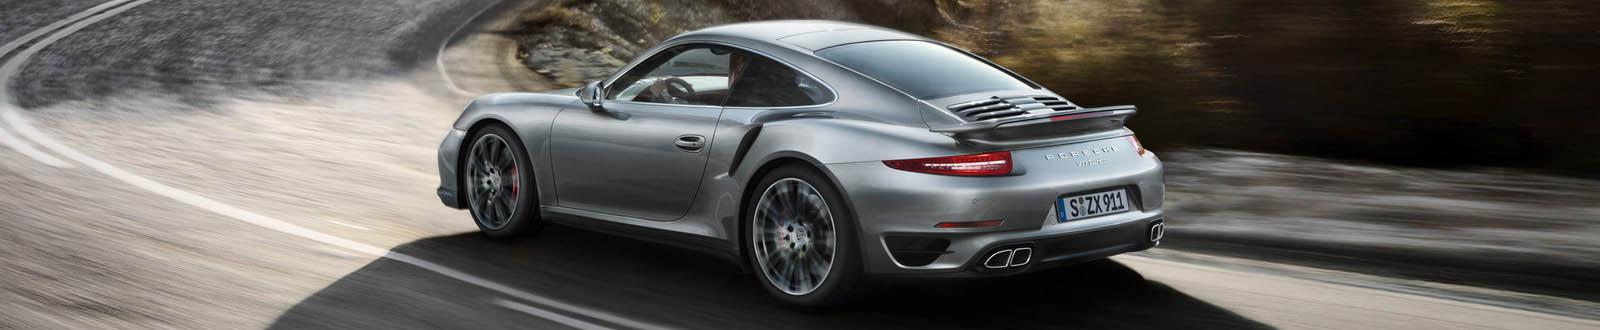 Porsche 991 Sport Design Ducktail Spoiler – NR Automobile Accessories